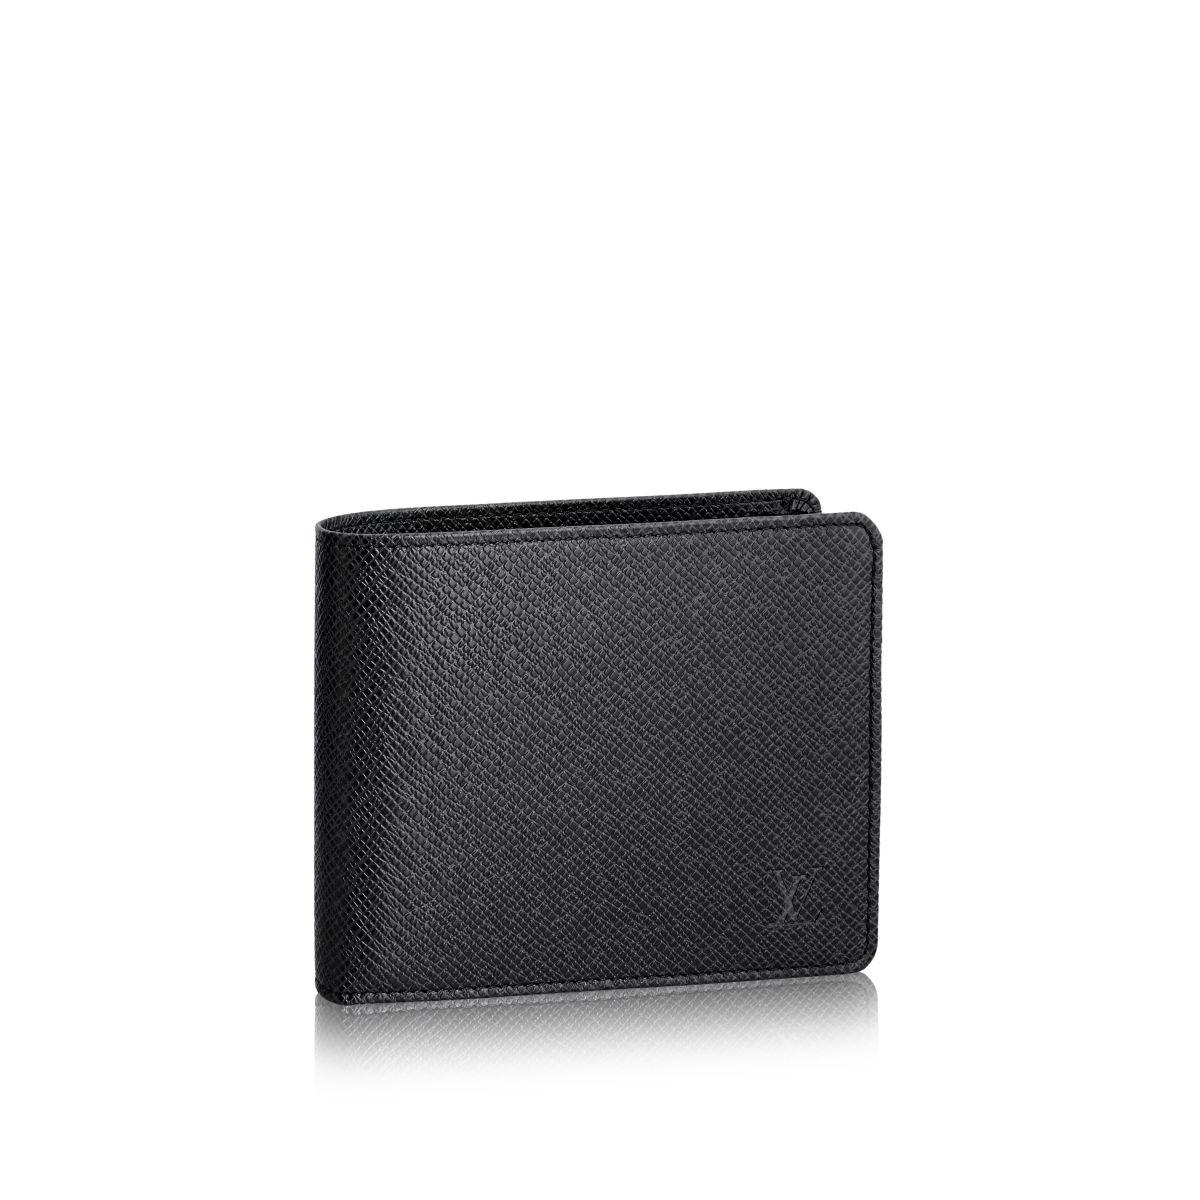 louis vuitton florin wallet in black for men ardoise lyst